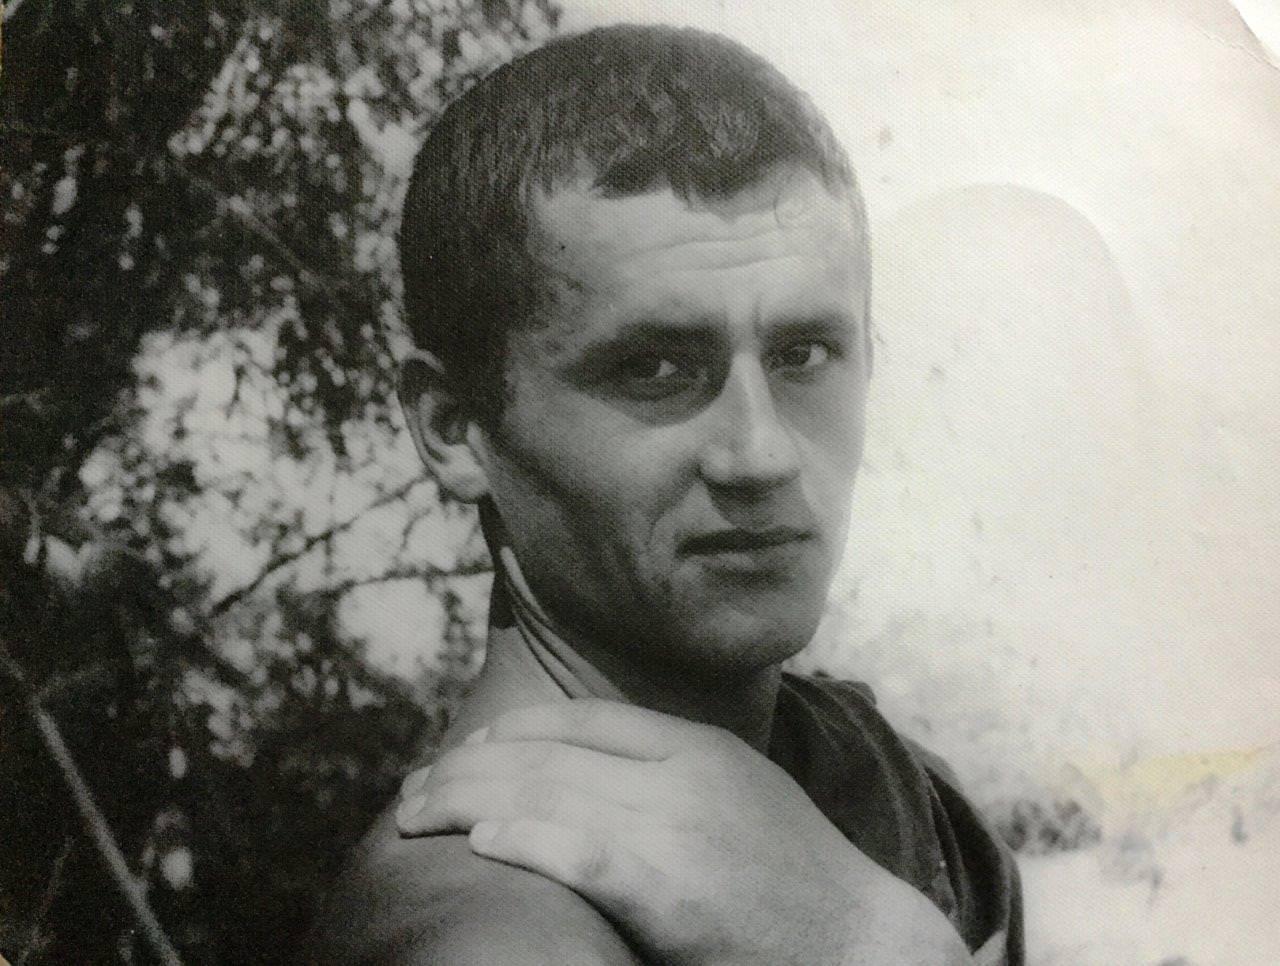 Кулаков Петр, взвод связи, 5 ОТБ, в/ч п.п. 89406, Нарокко, декабрь 1968 – май 1970